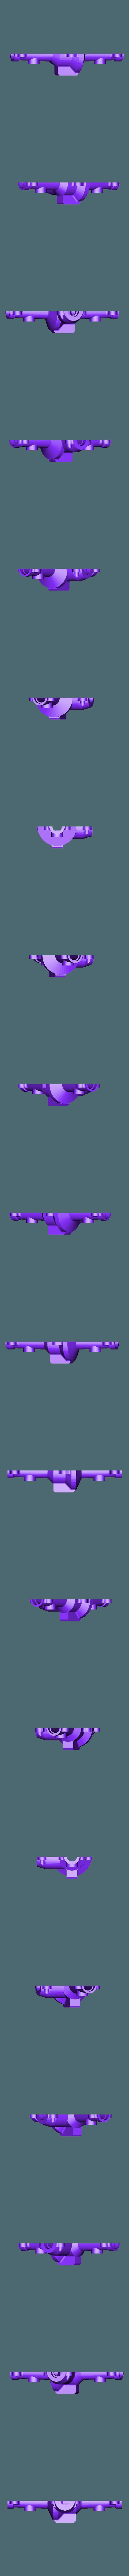 Diffhub_top.STL Download free STL file Printed truck: Rear axle V1 • 3D print model, MrCrankyface